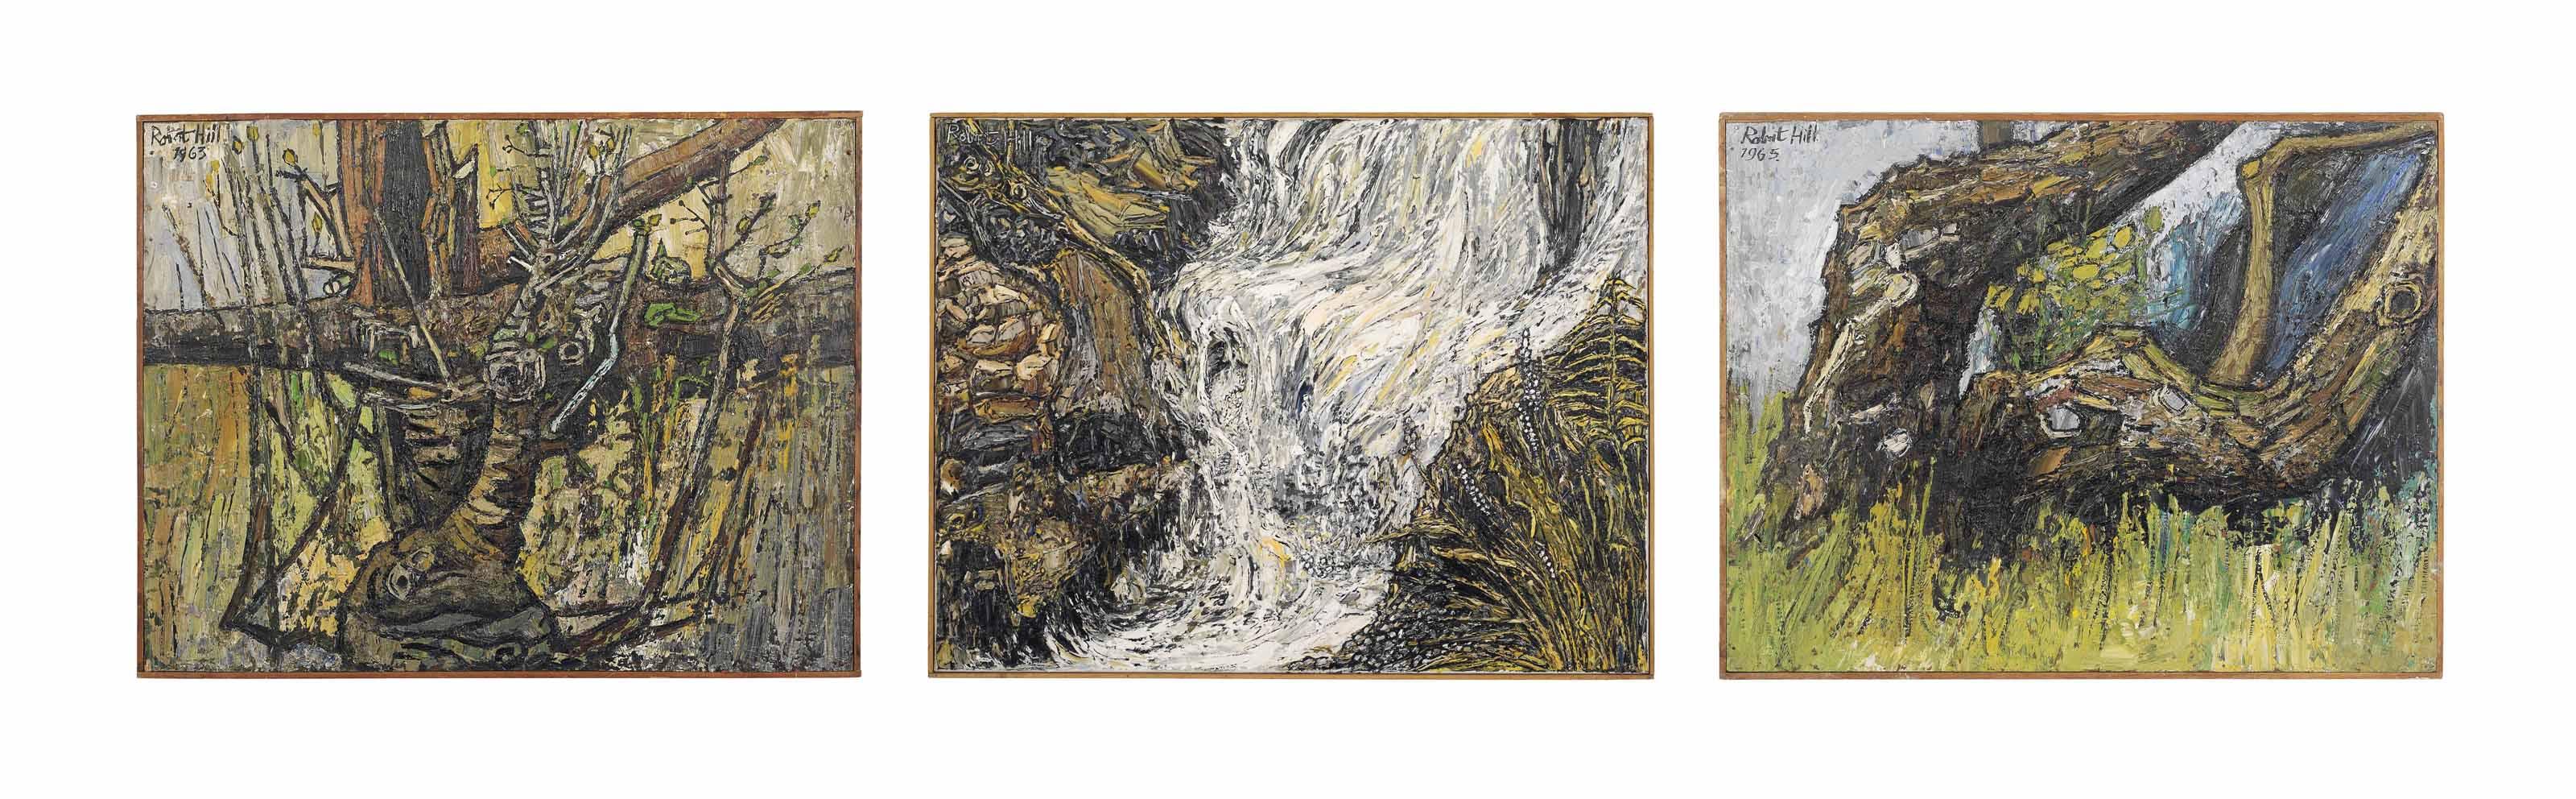 Waterfall; Apple tree; Hollow trunk